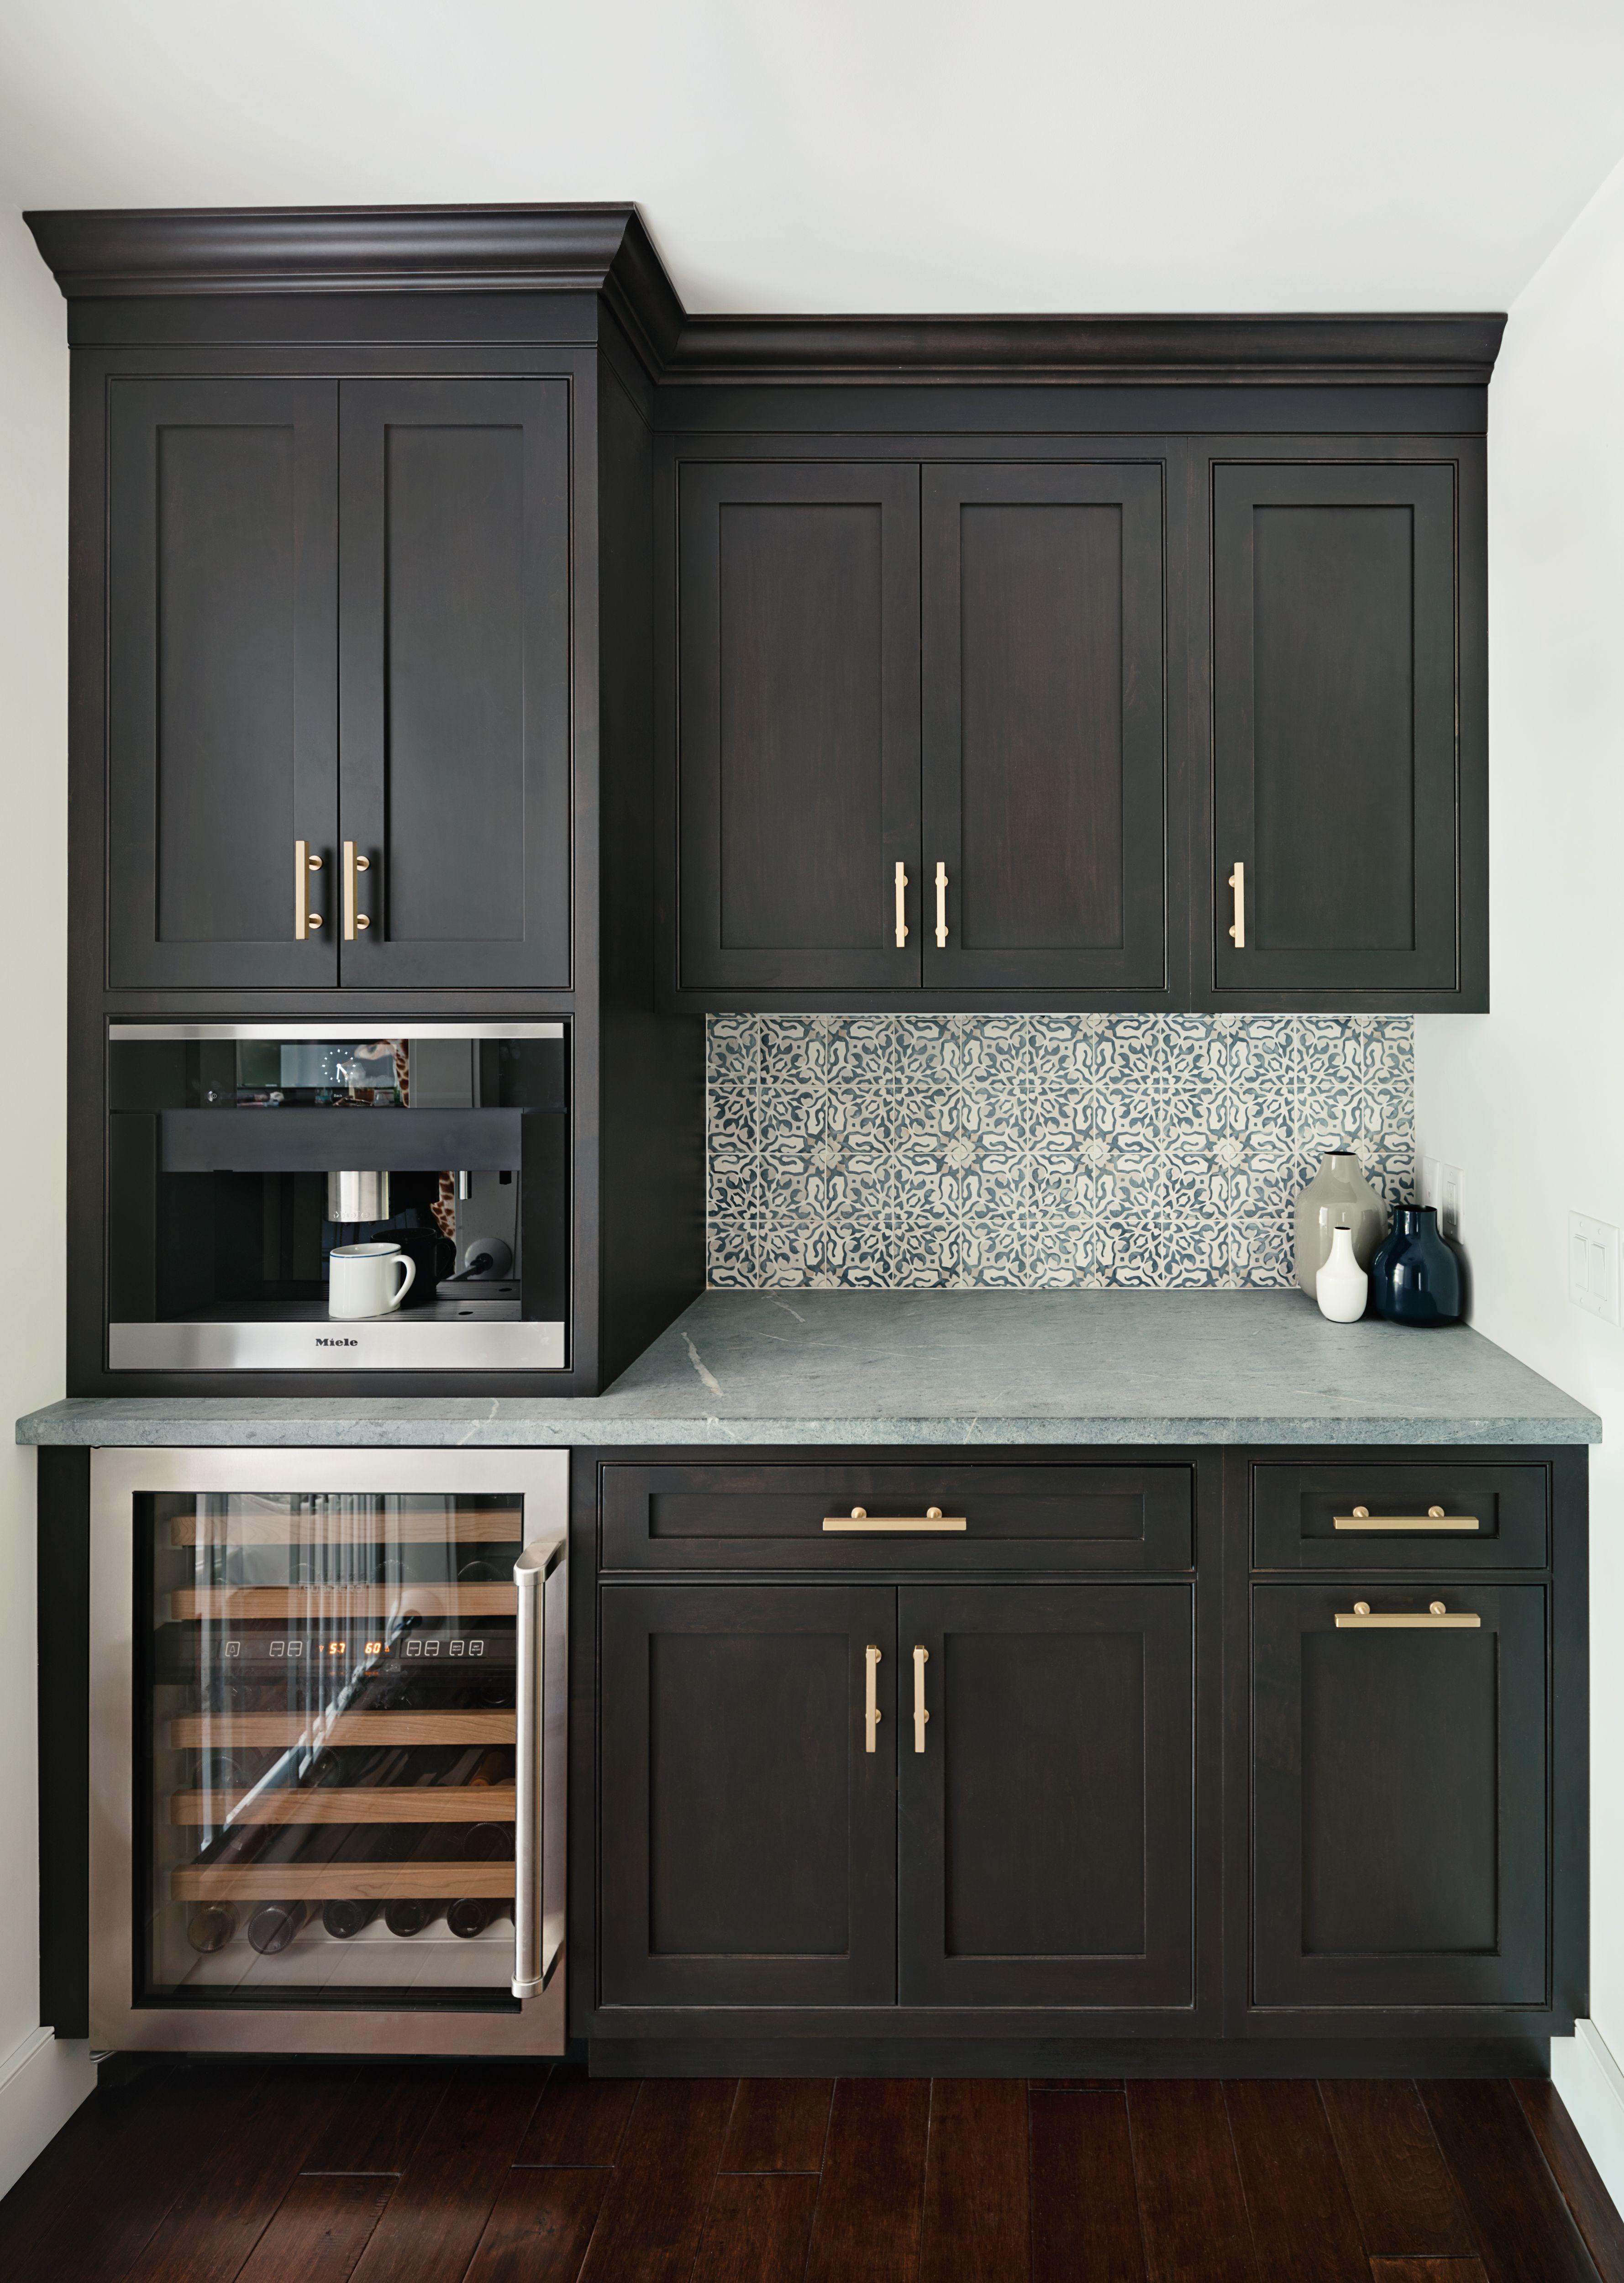 Oakwood Residence Butlers Pantry Z Interiors Black Kitchen Cabinets Kitchen Remodel Black Kitchens